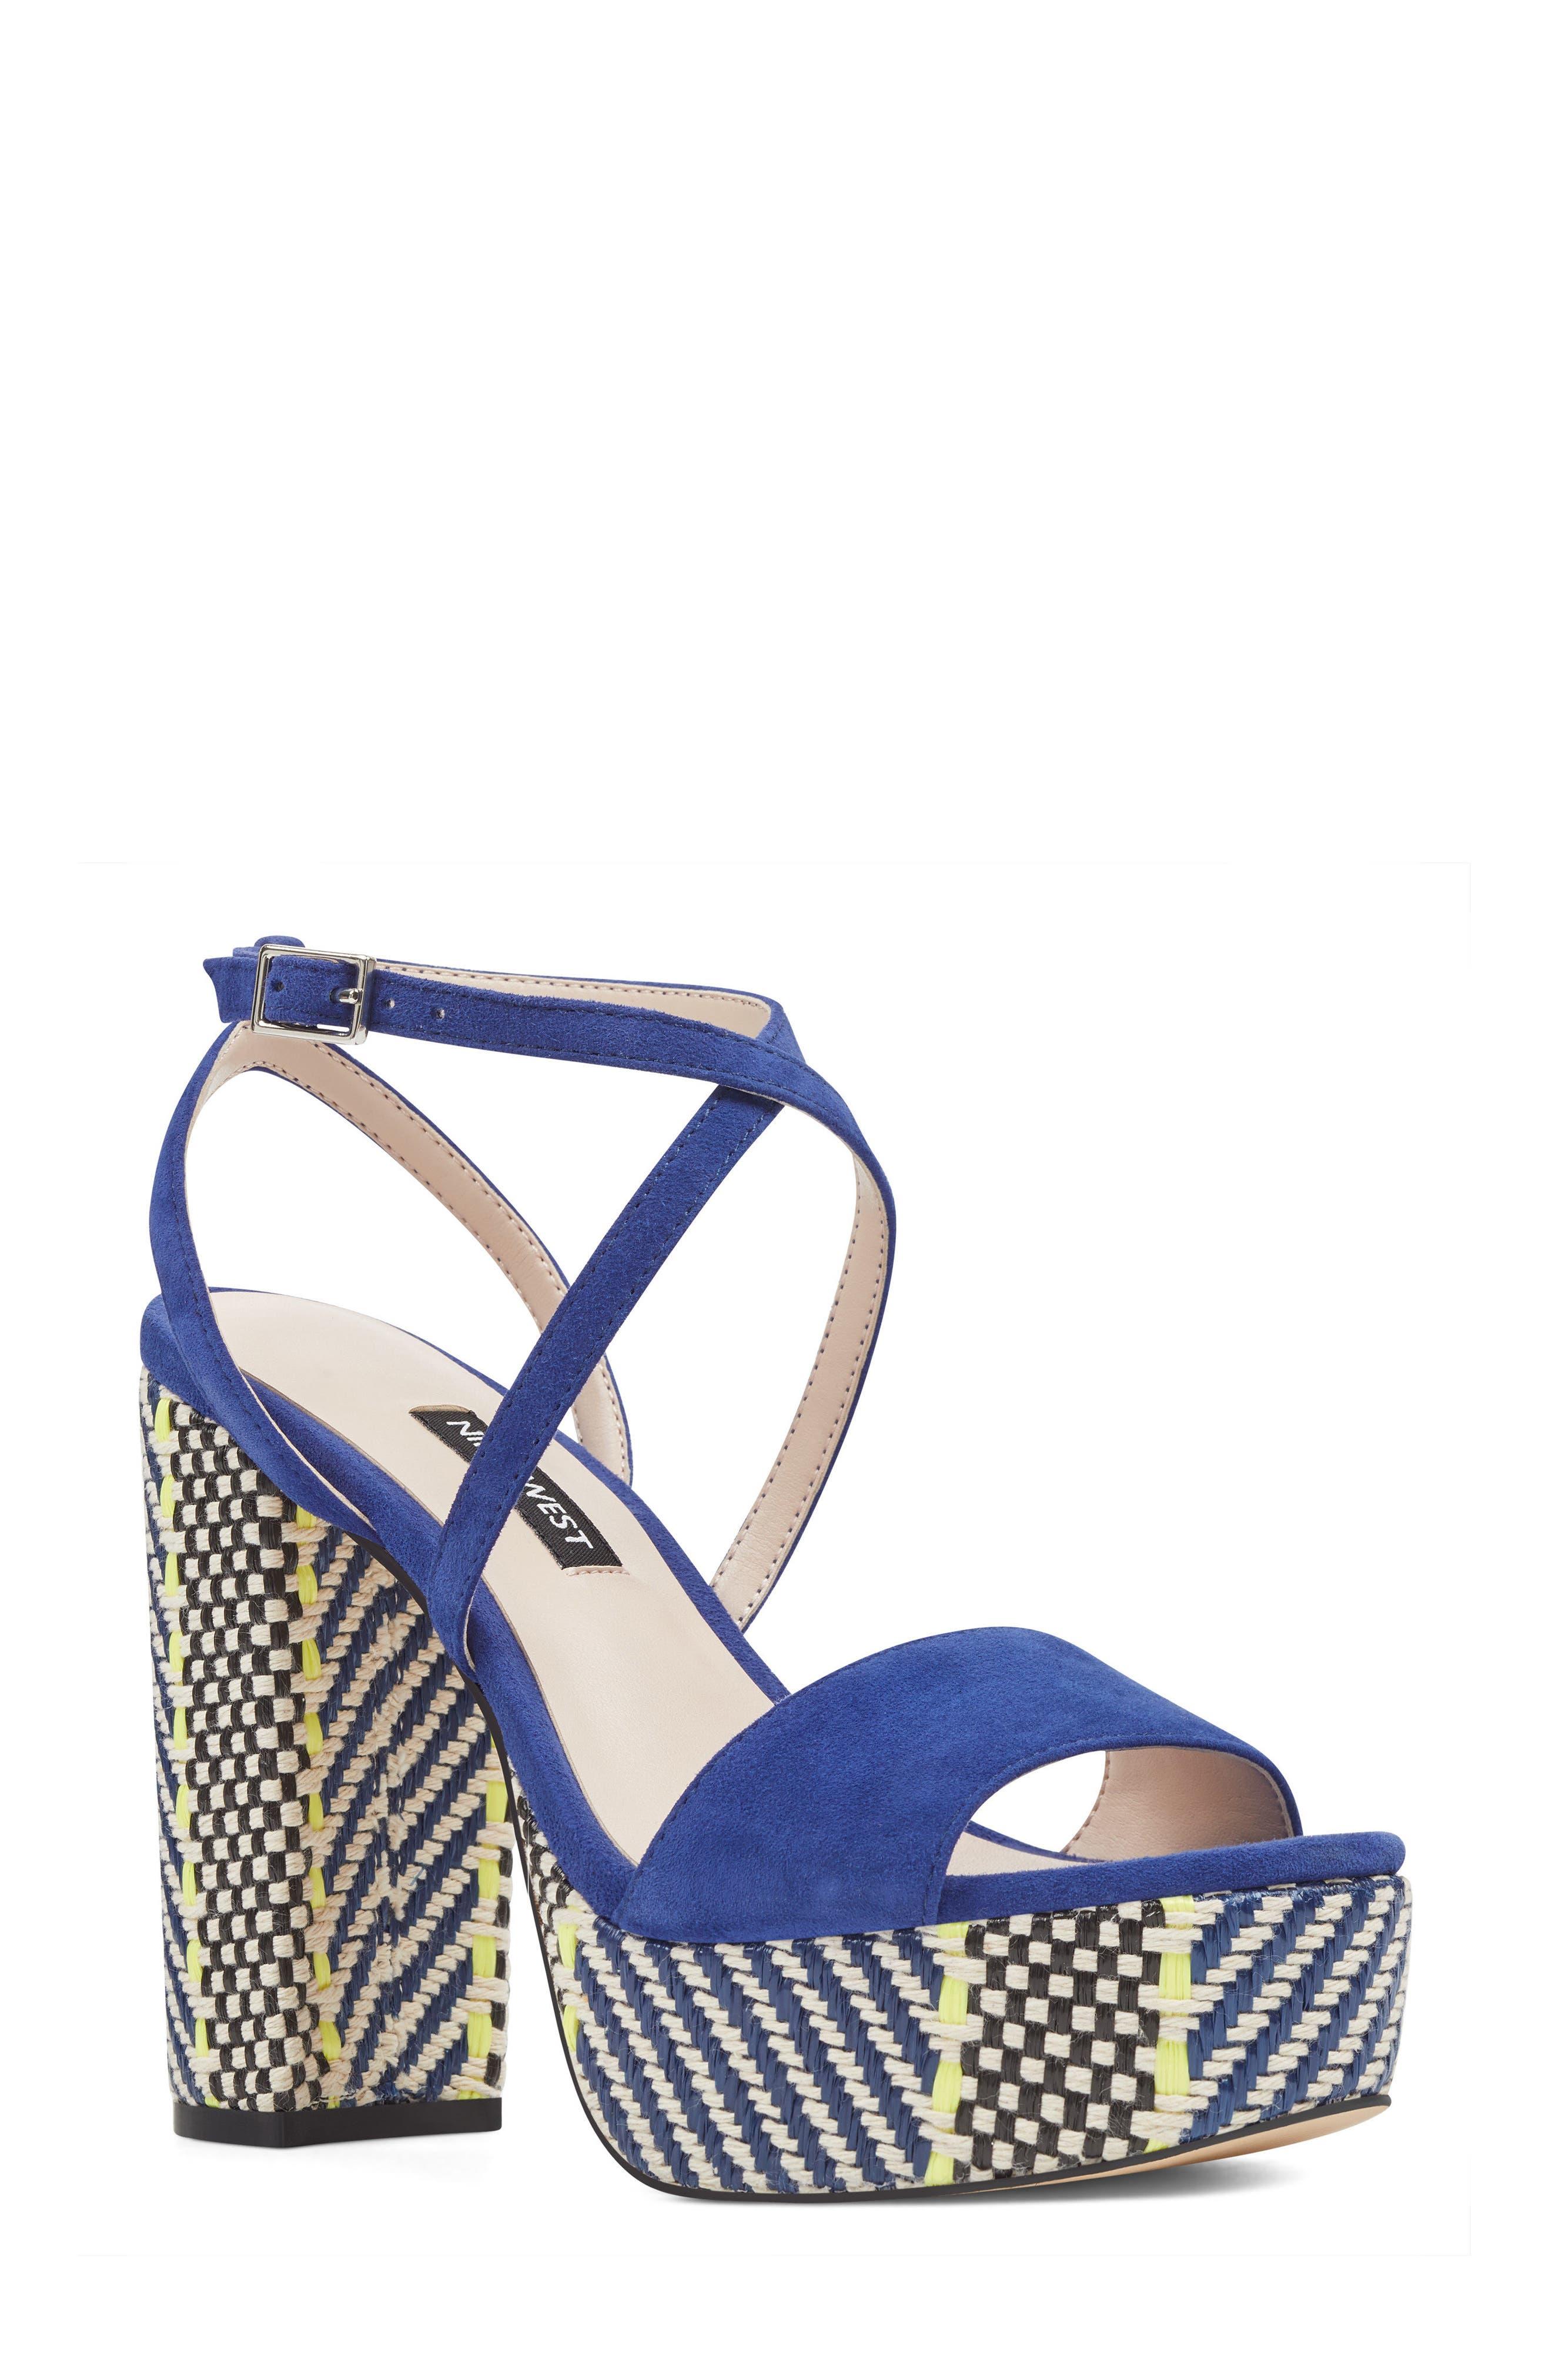 Markando Platform Sandal,                         Main,                         color, Dark Blue Suede